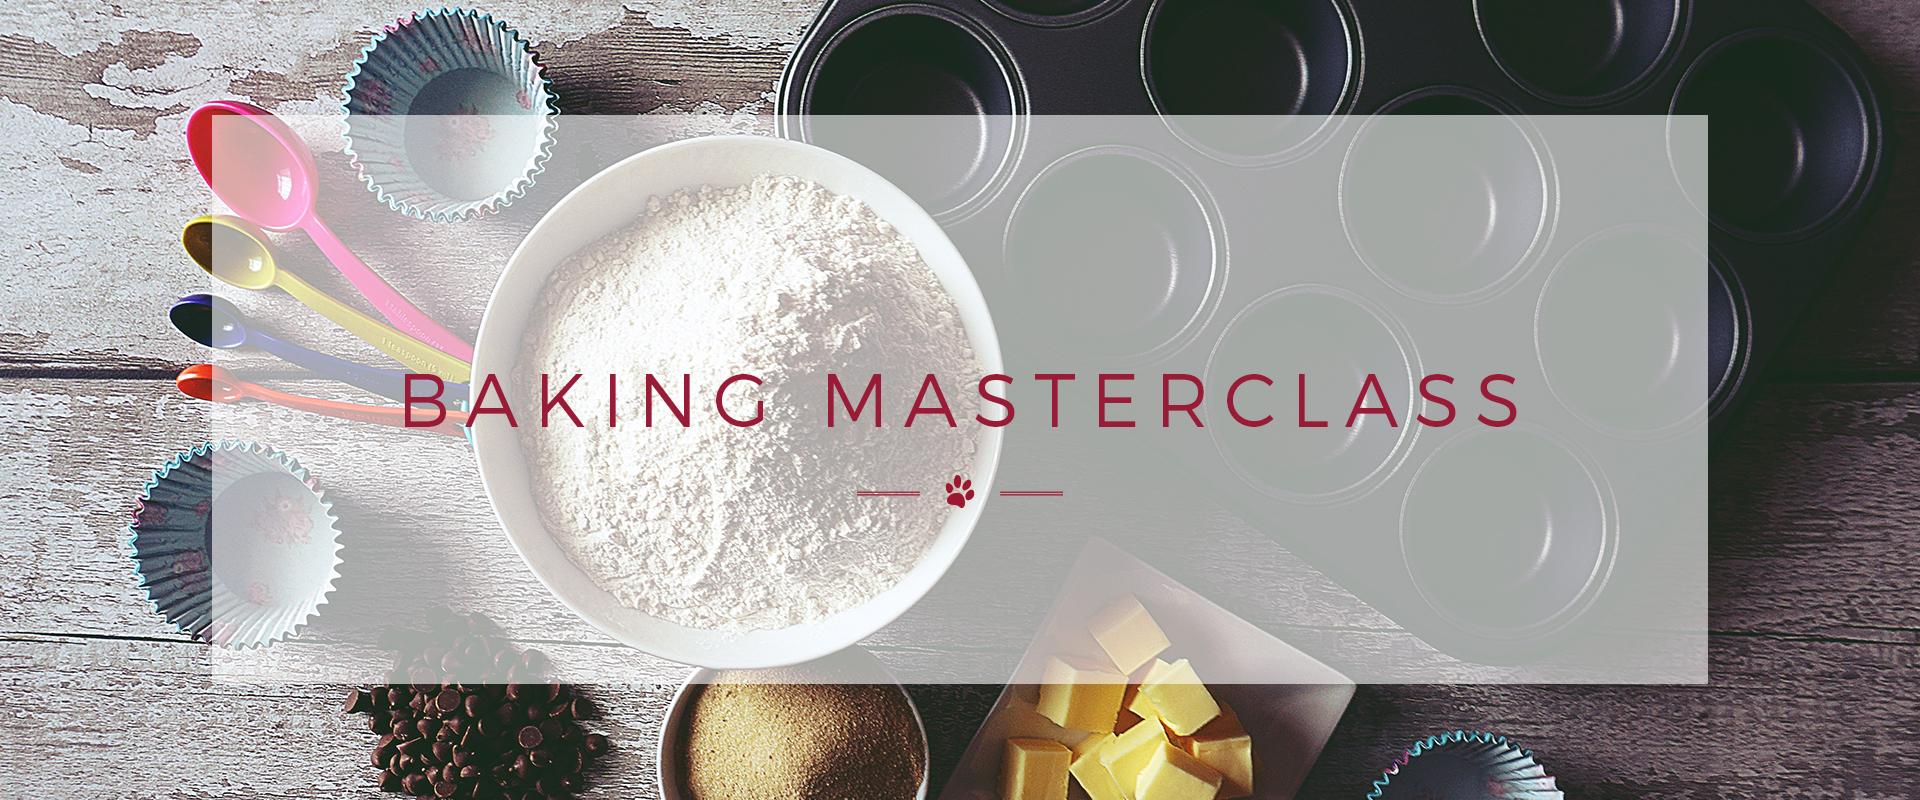 Baking masterclass at the Tearooms Flintshire